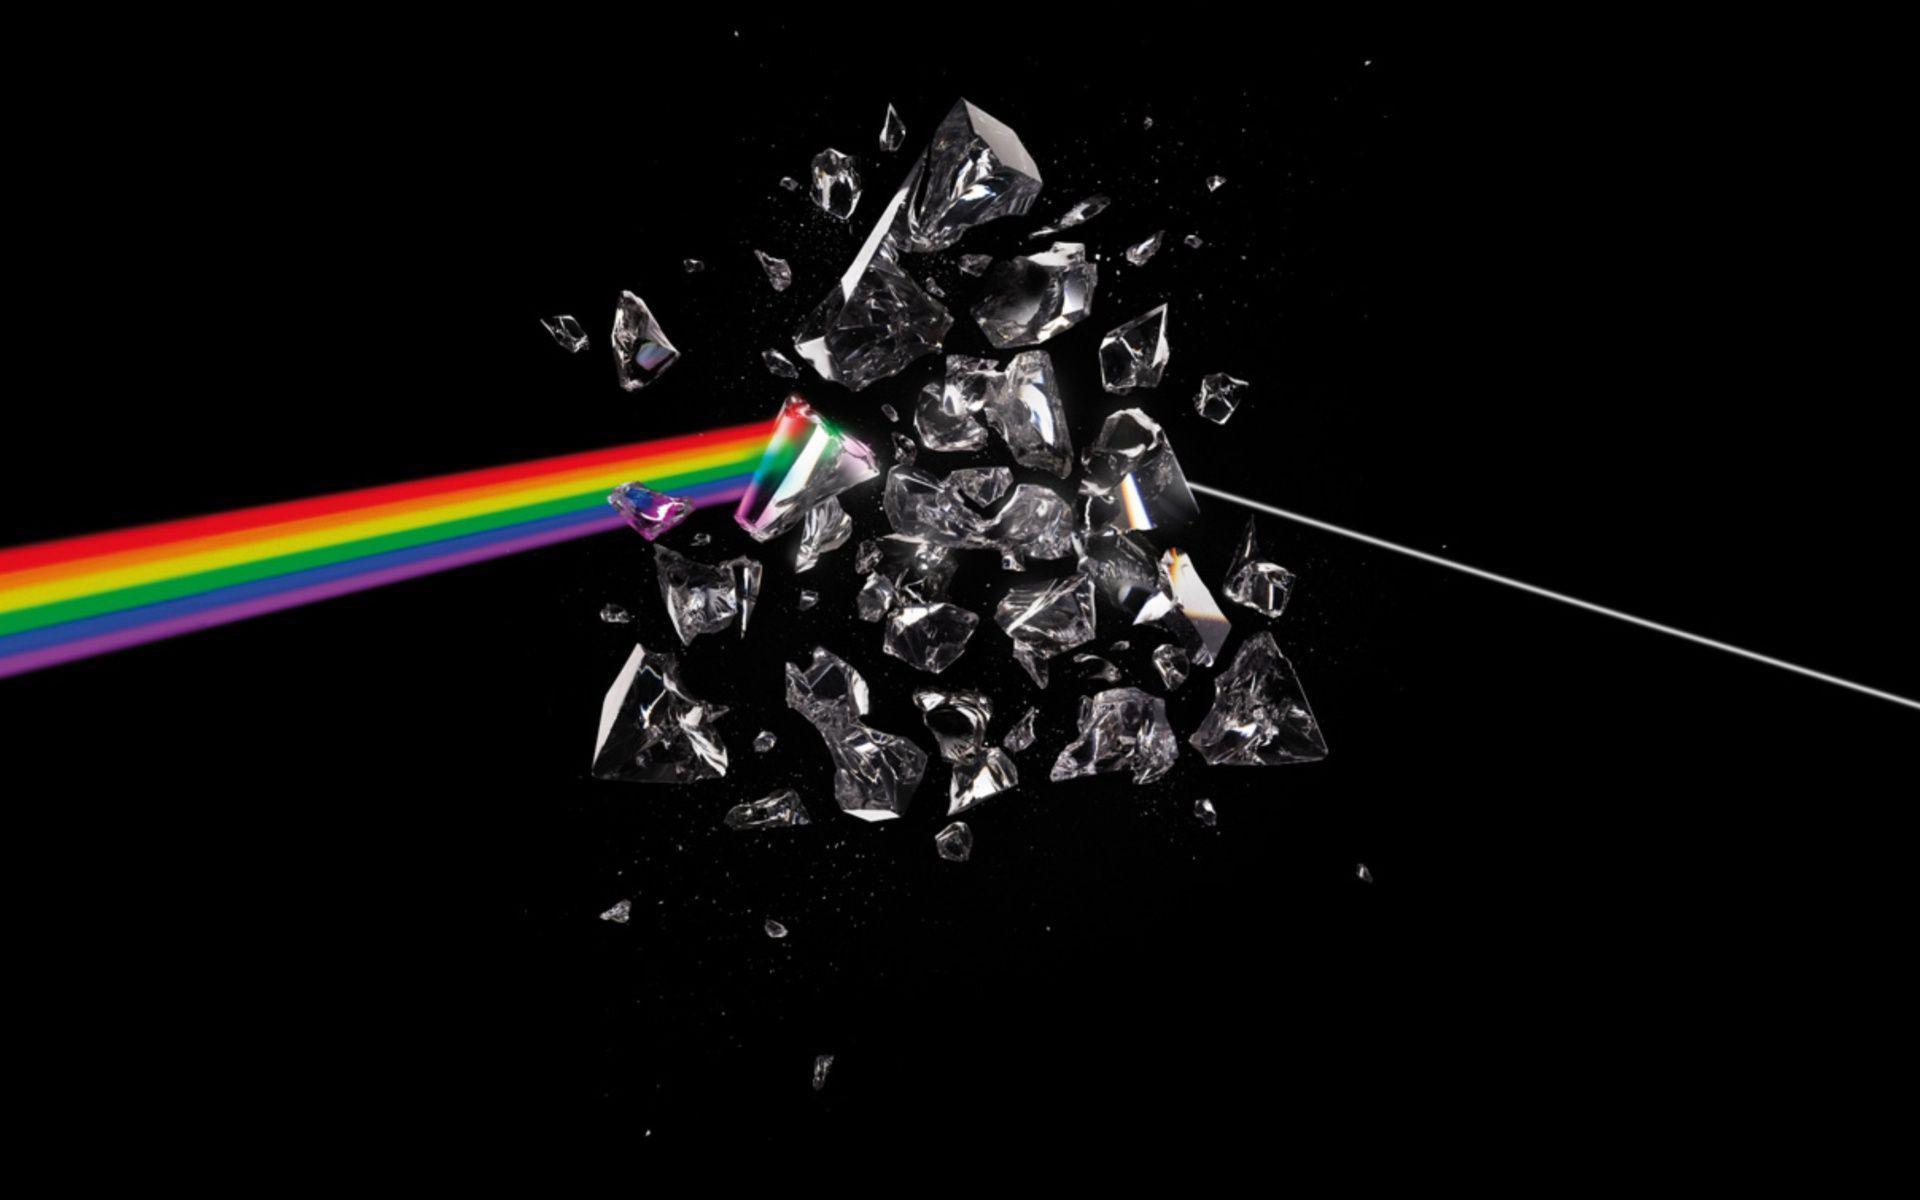 Desktop Pink Floyd HD Wallpapers | PixelsTalk.Net